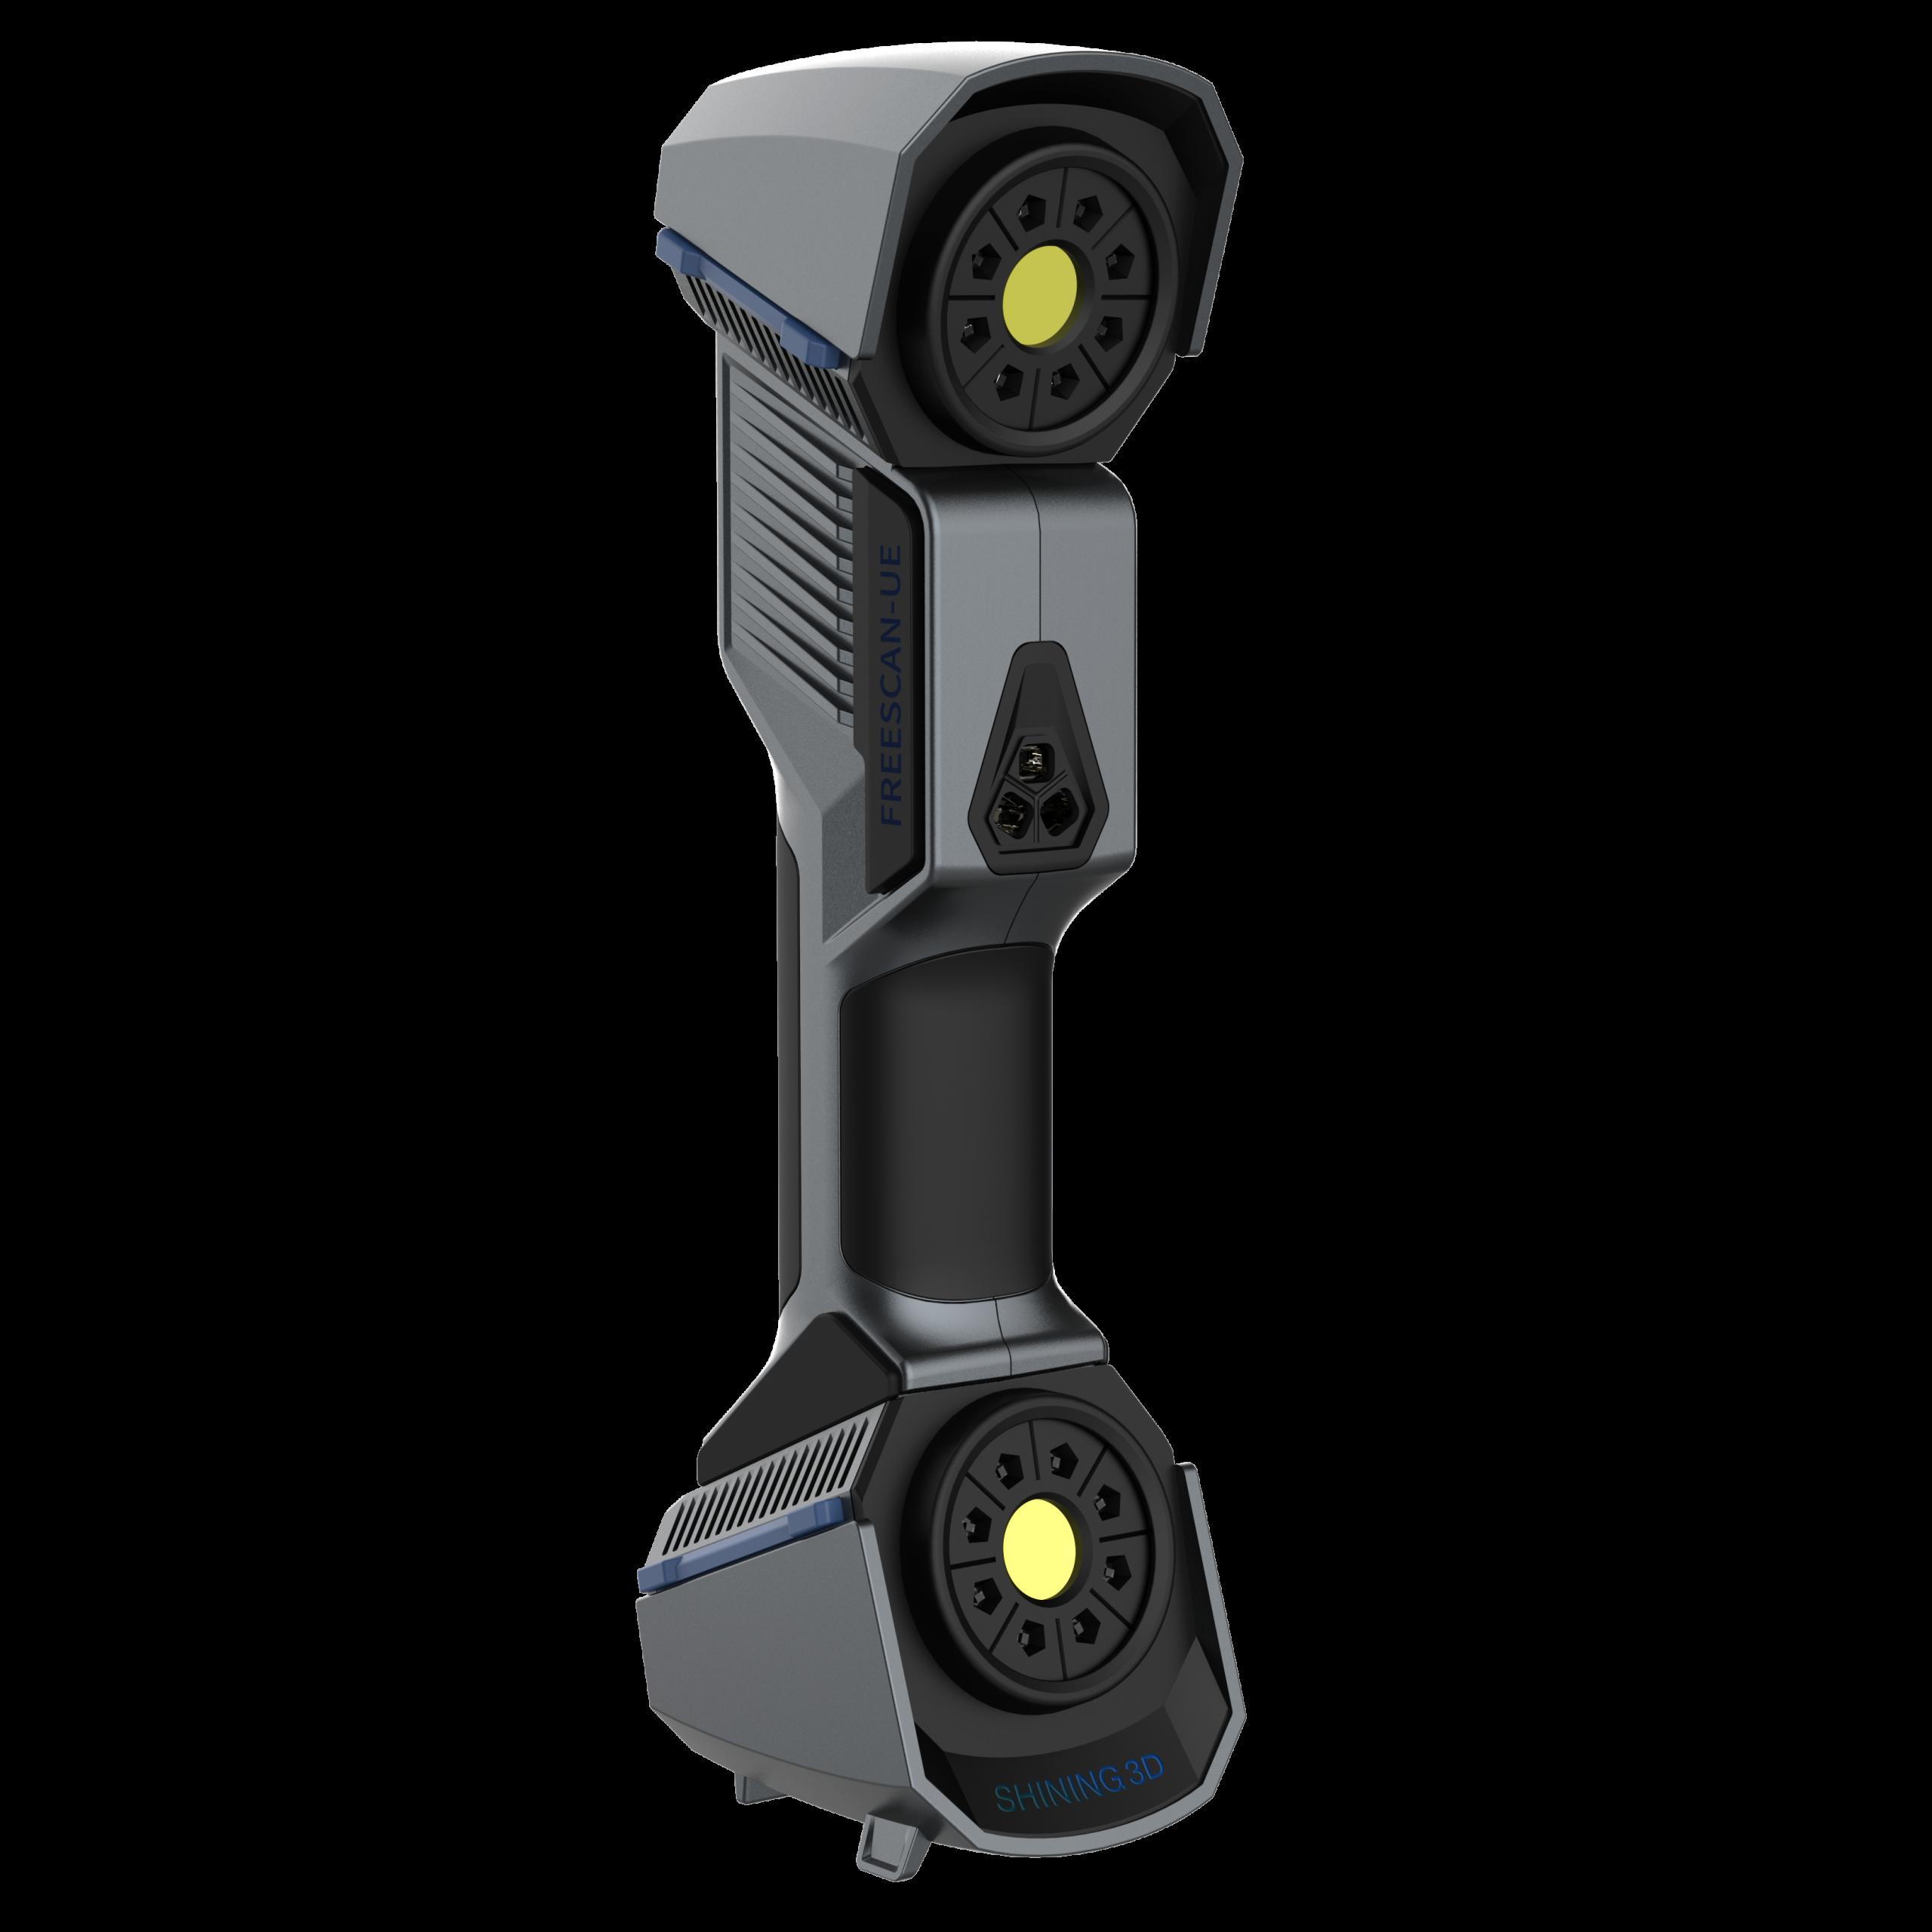 Shining 3D FreeScan UE 3D scanning for metrology